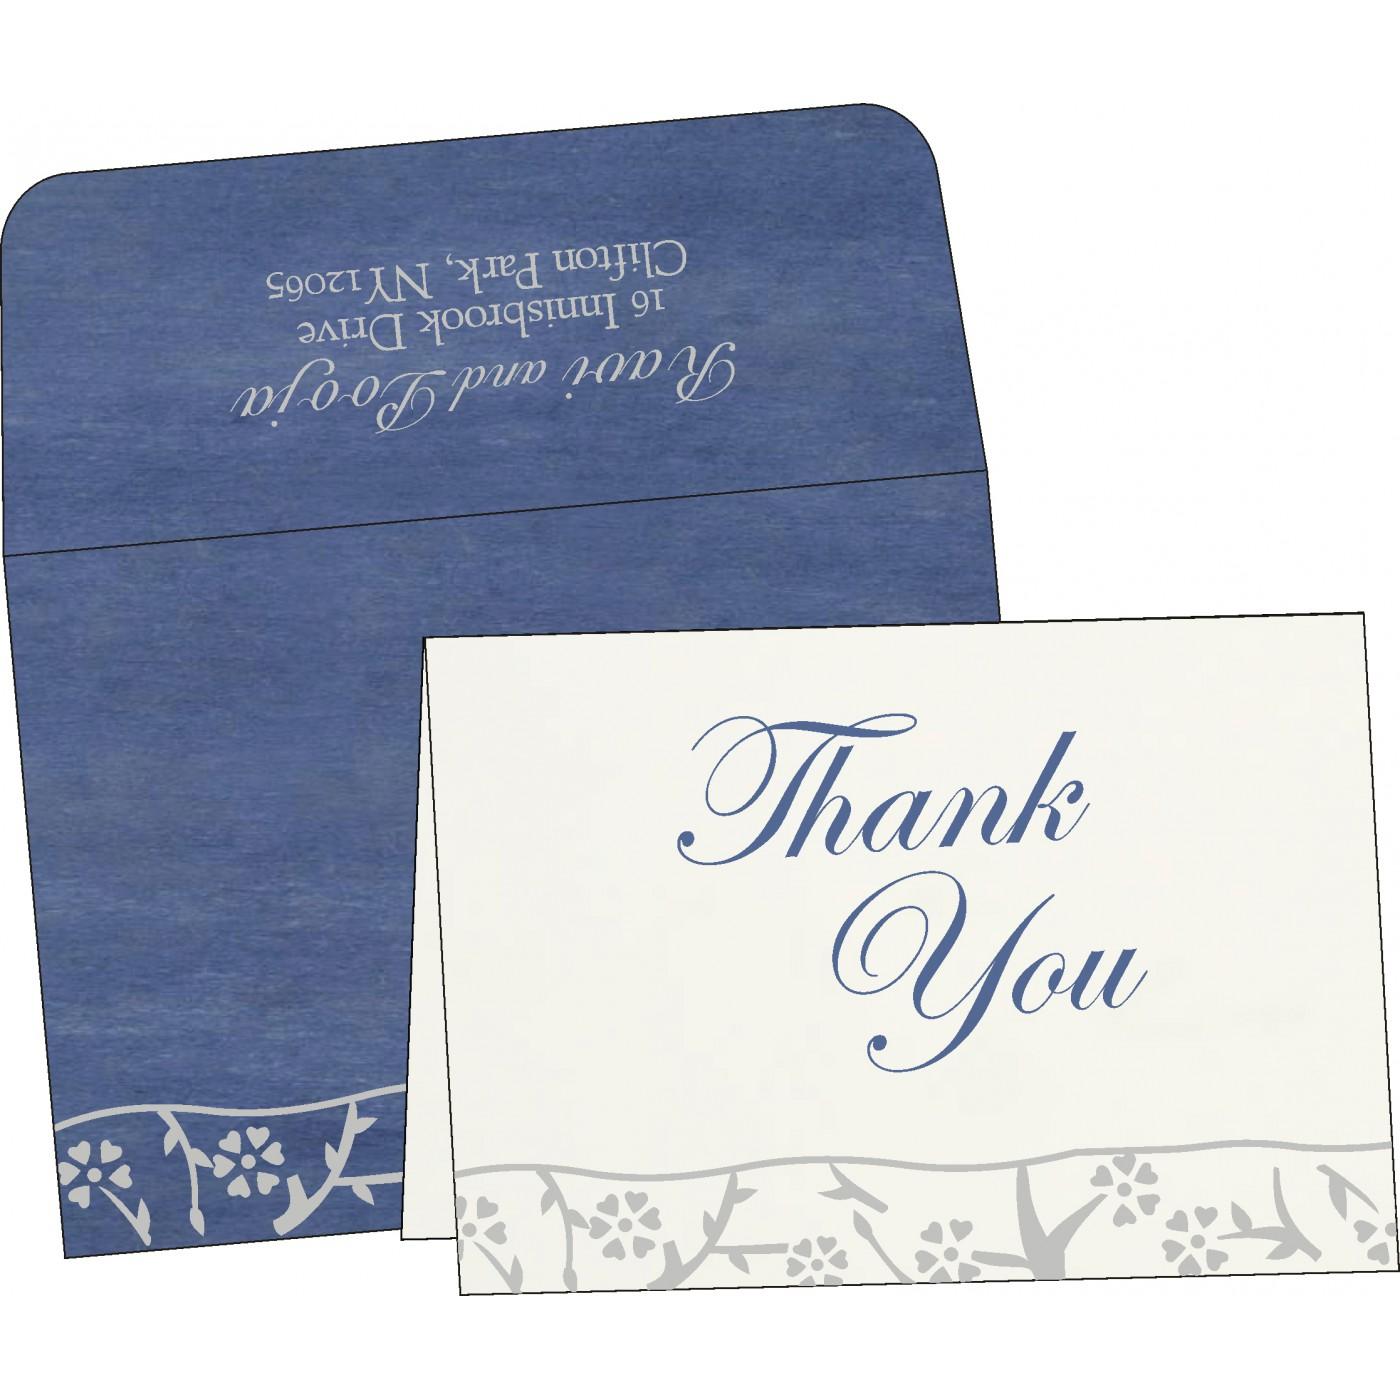 Thank You Cards : TYC-8216D - 123WeddingCards